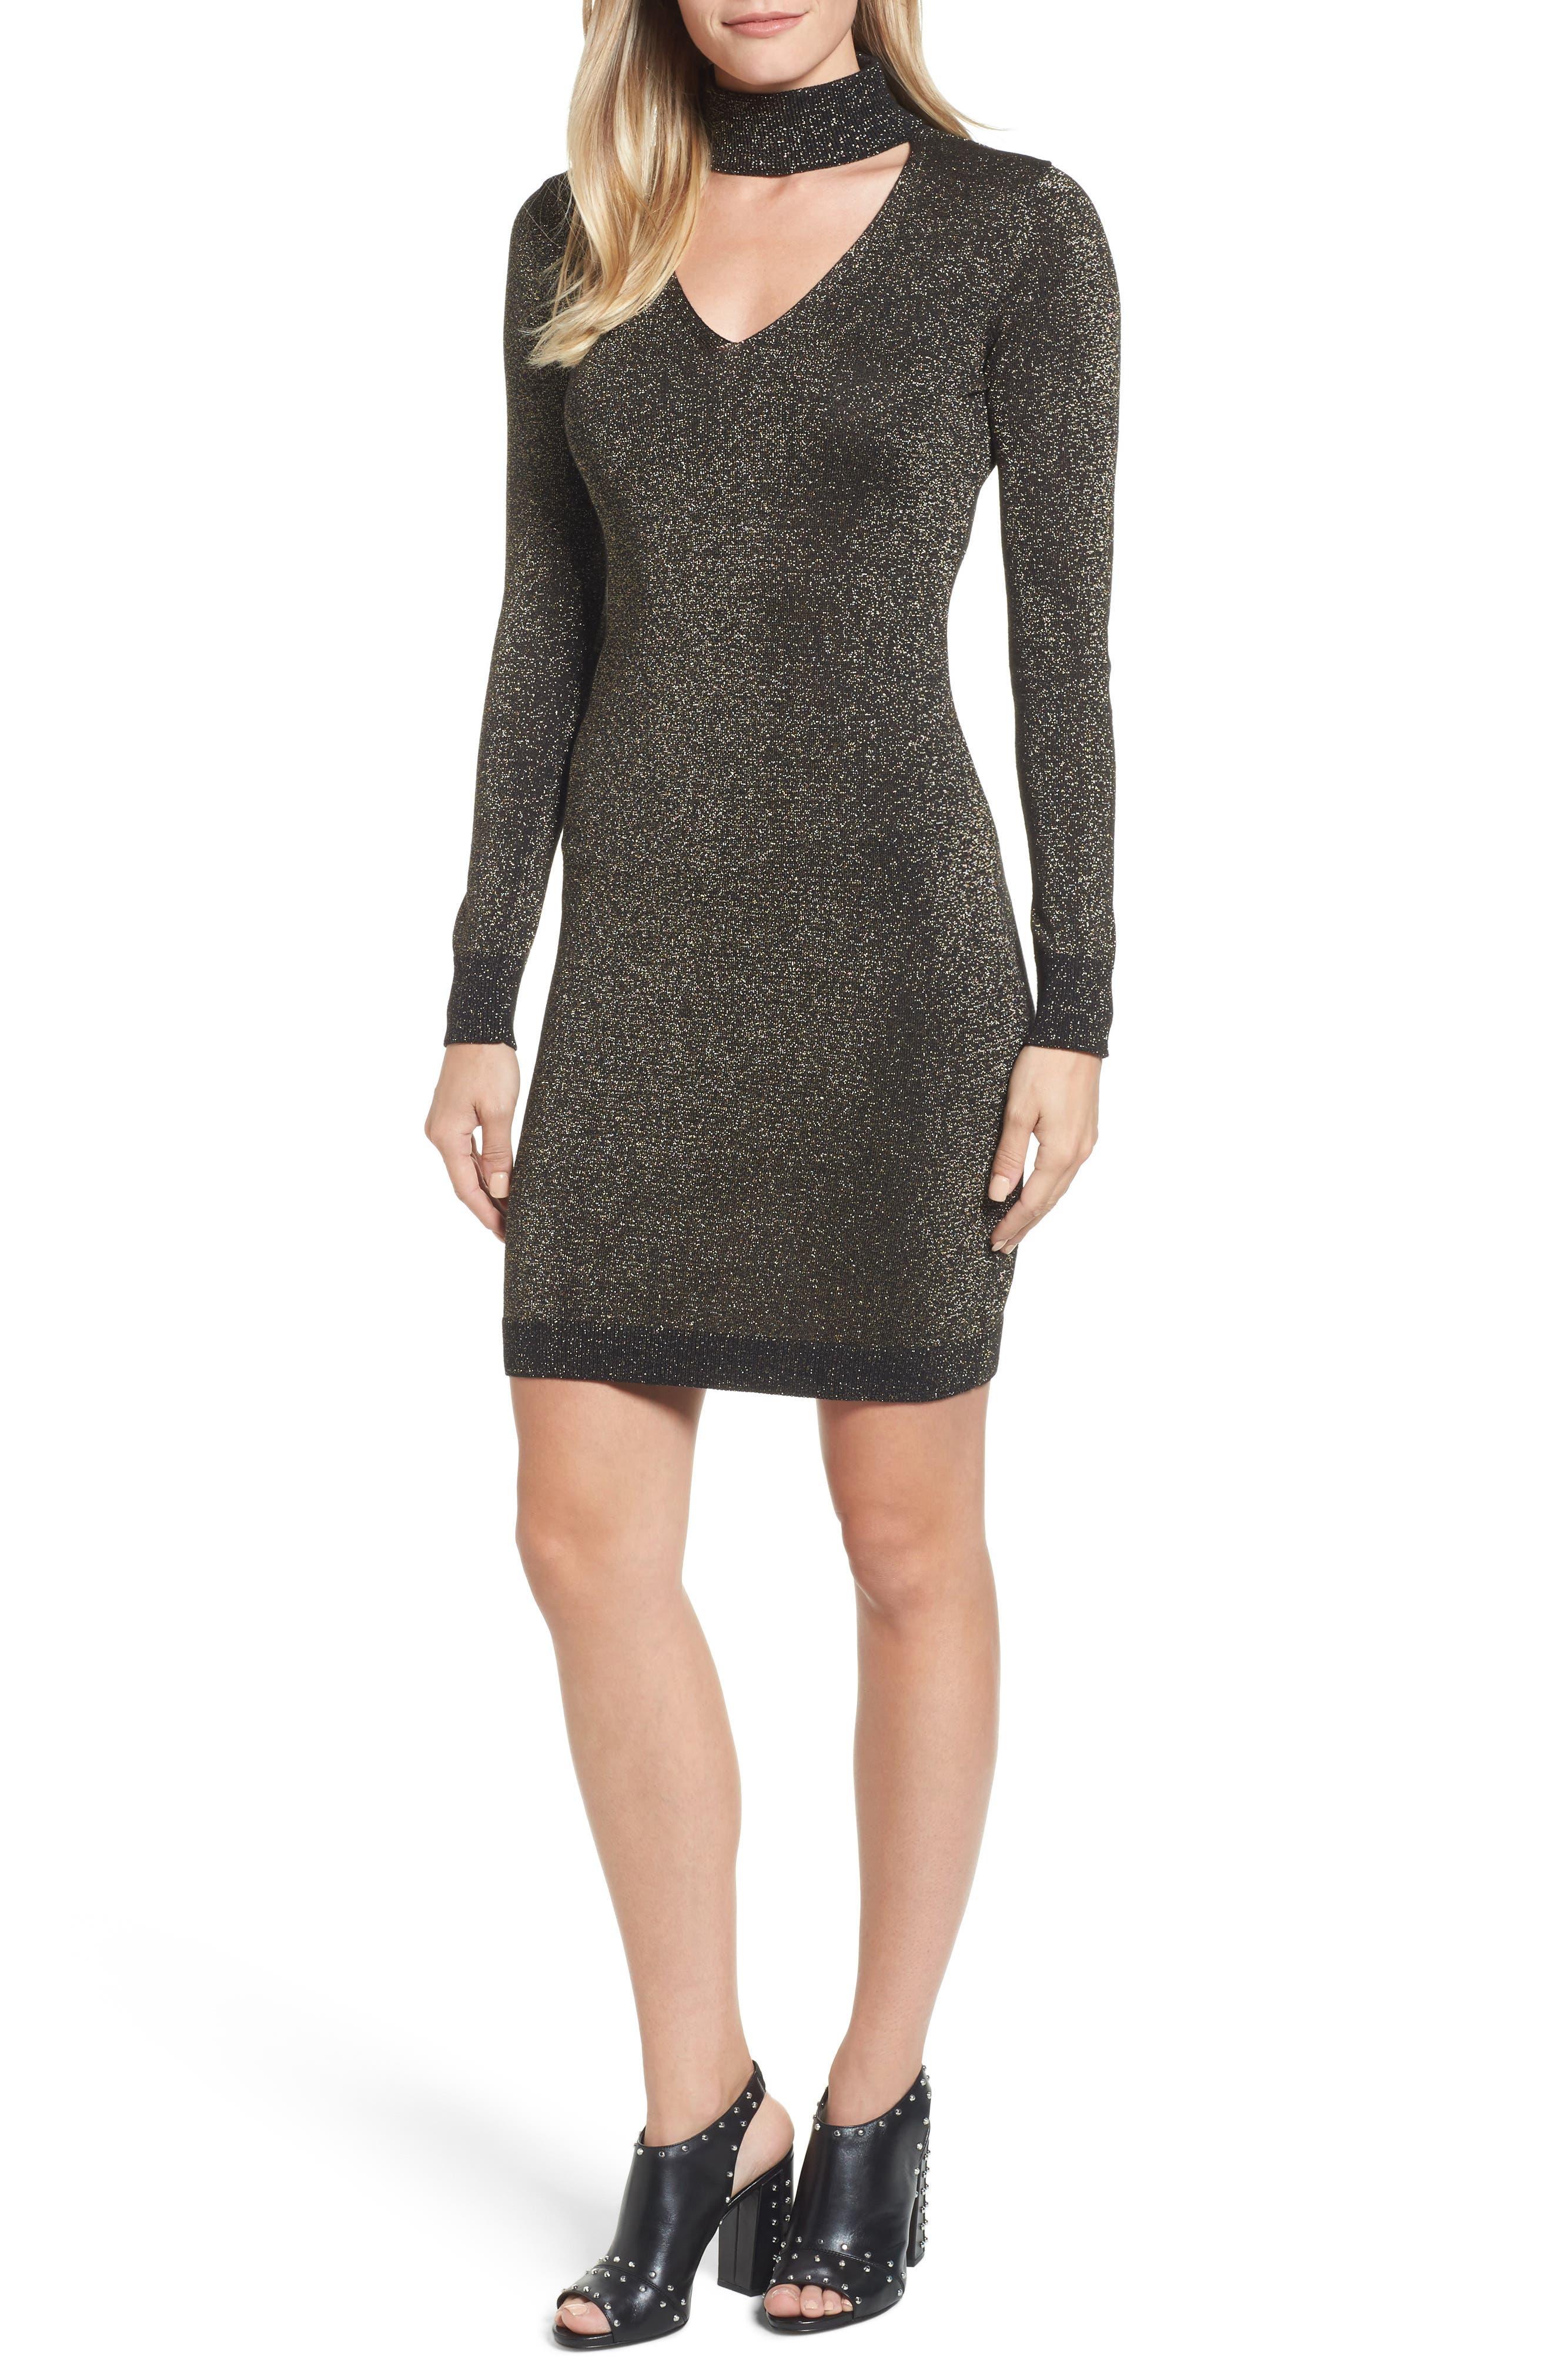 Alternate Image 1 Selected - MICHAEL Michael Kors Choker Sweater Dress